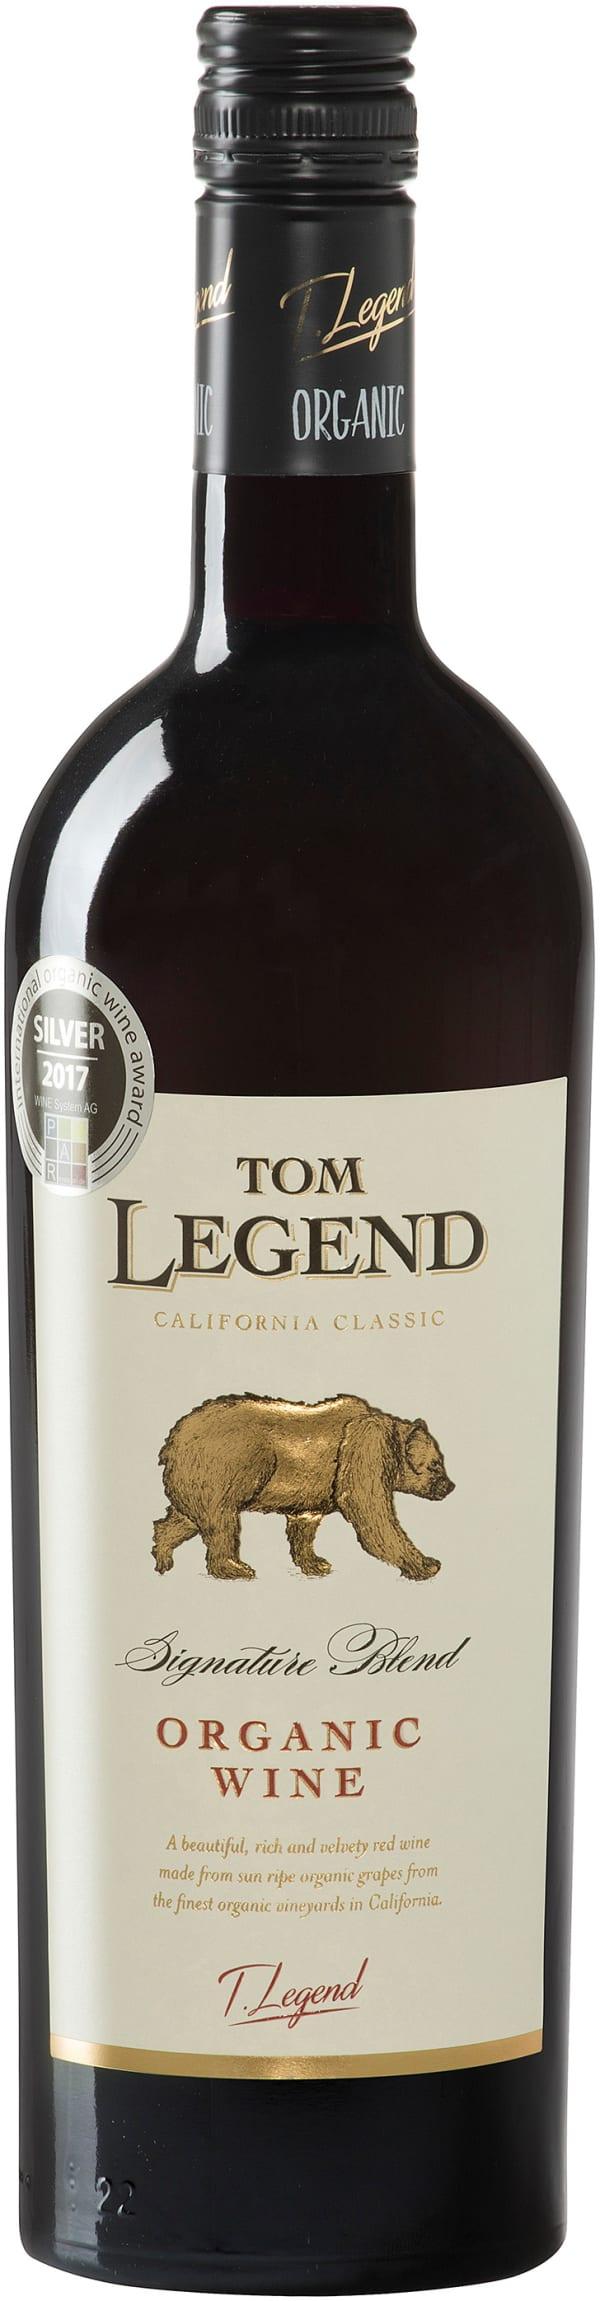 Tom Legend Organic 2015